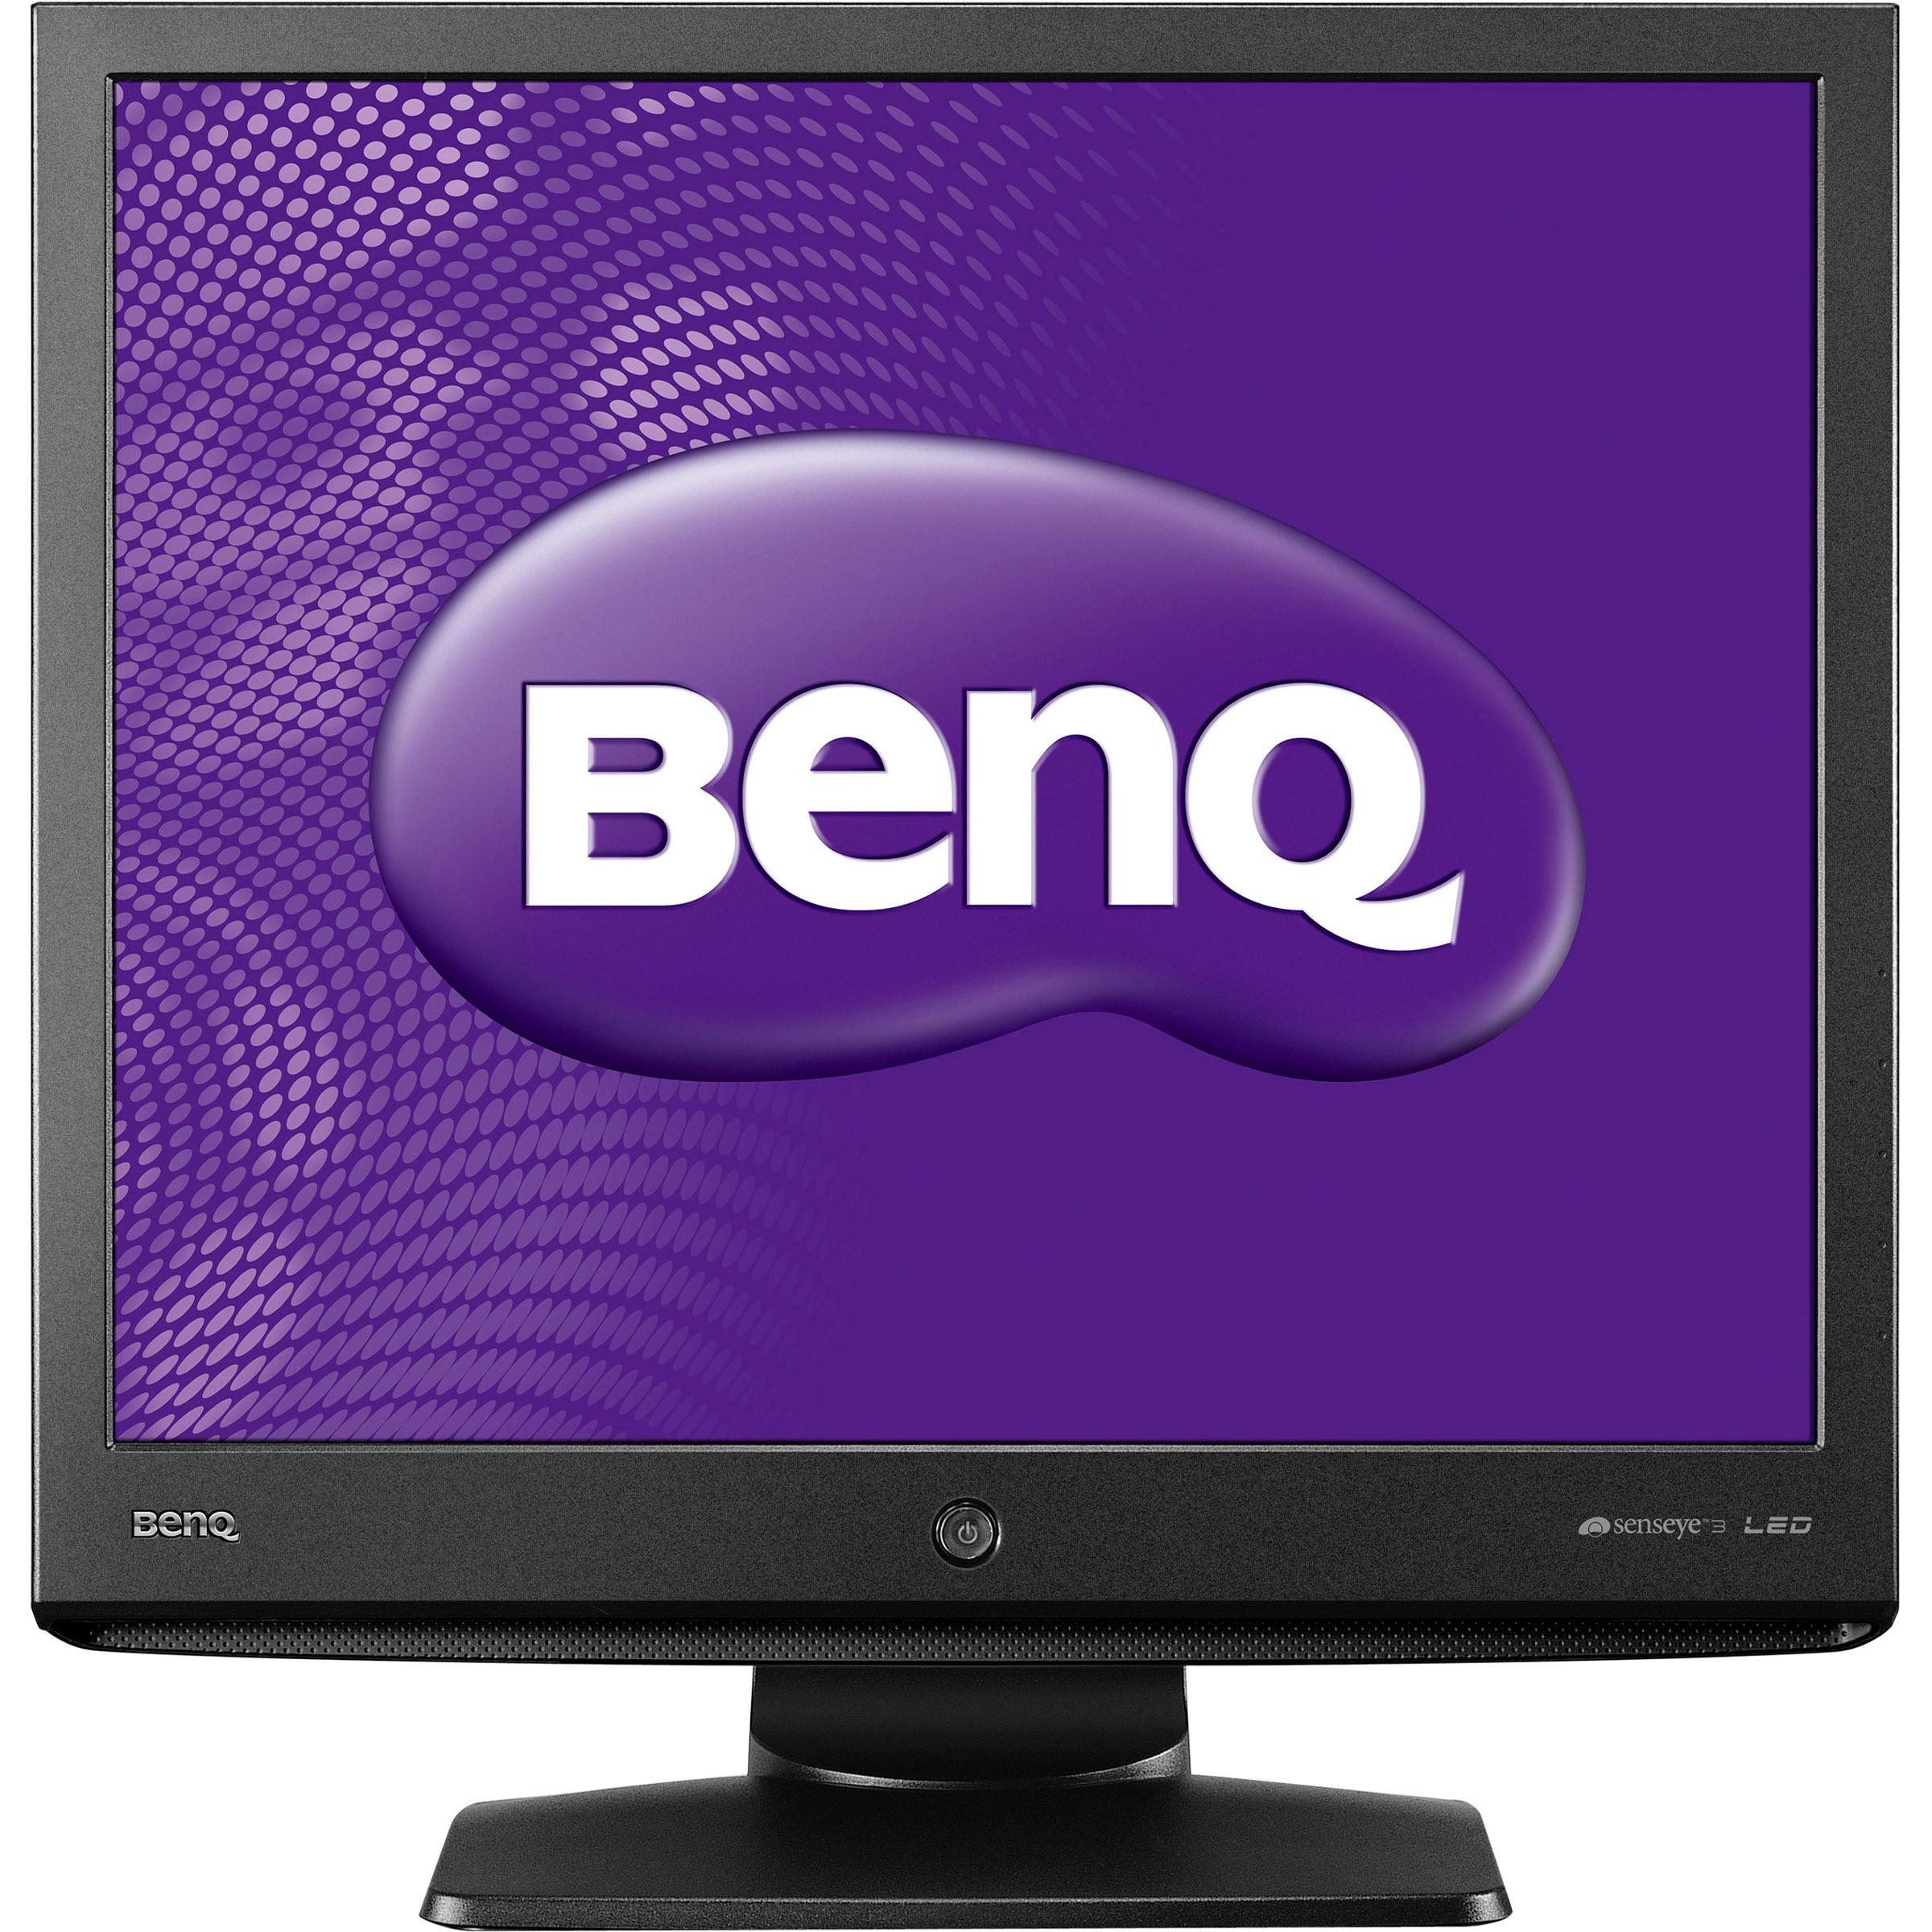 BenQ BL912 48.3 cm 19inch LED LCD Monitor - 5:4 - 5 ms